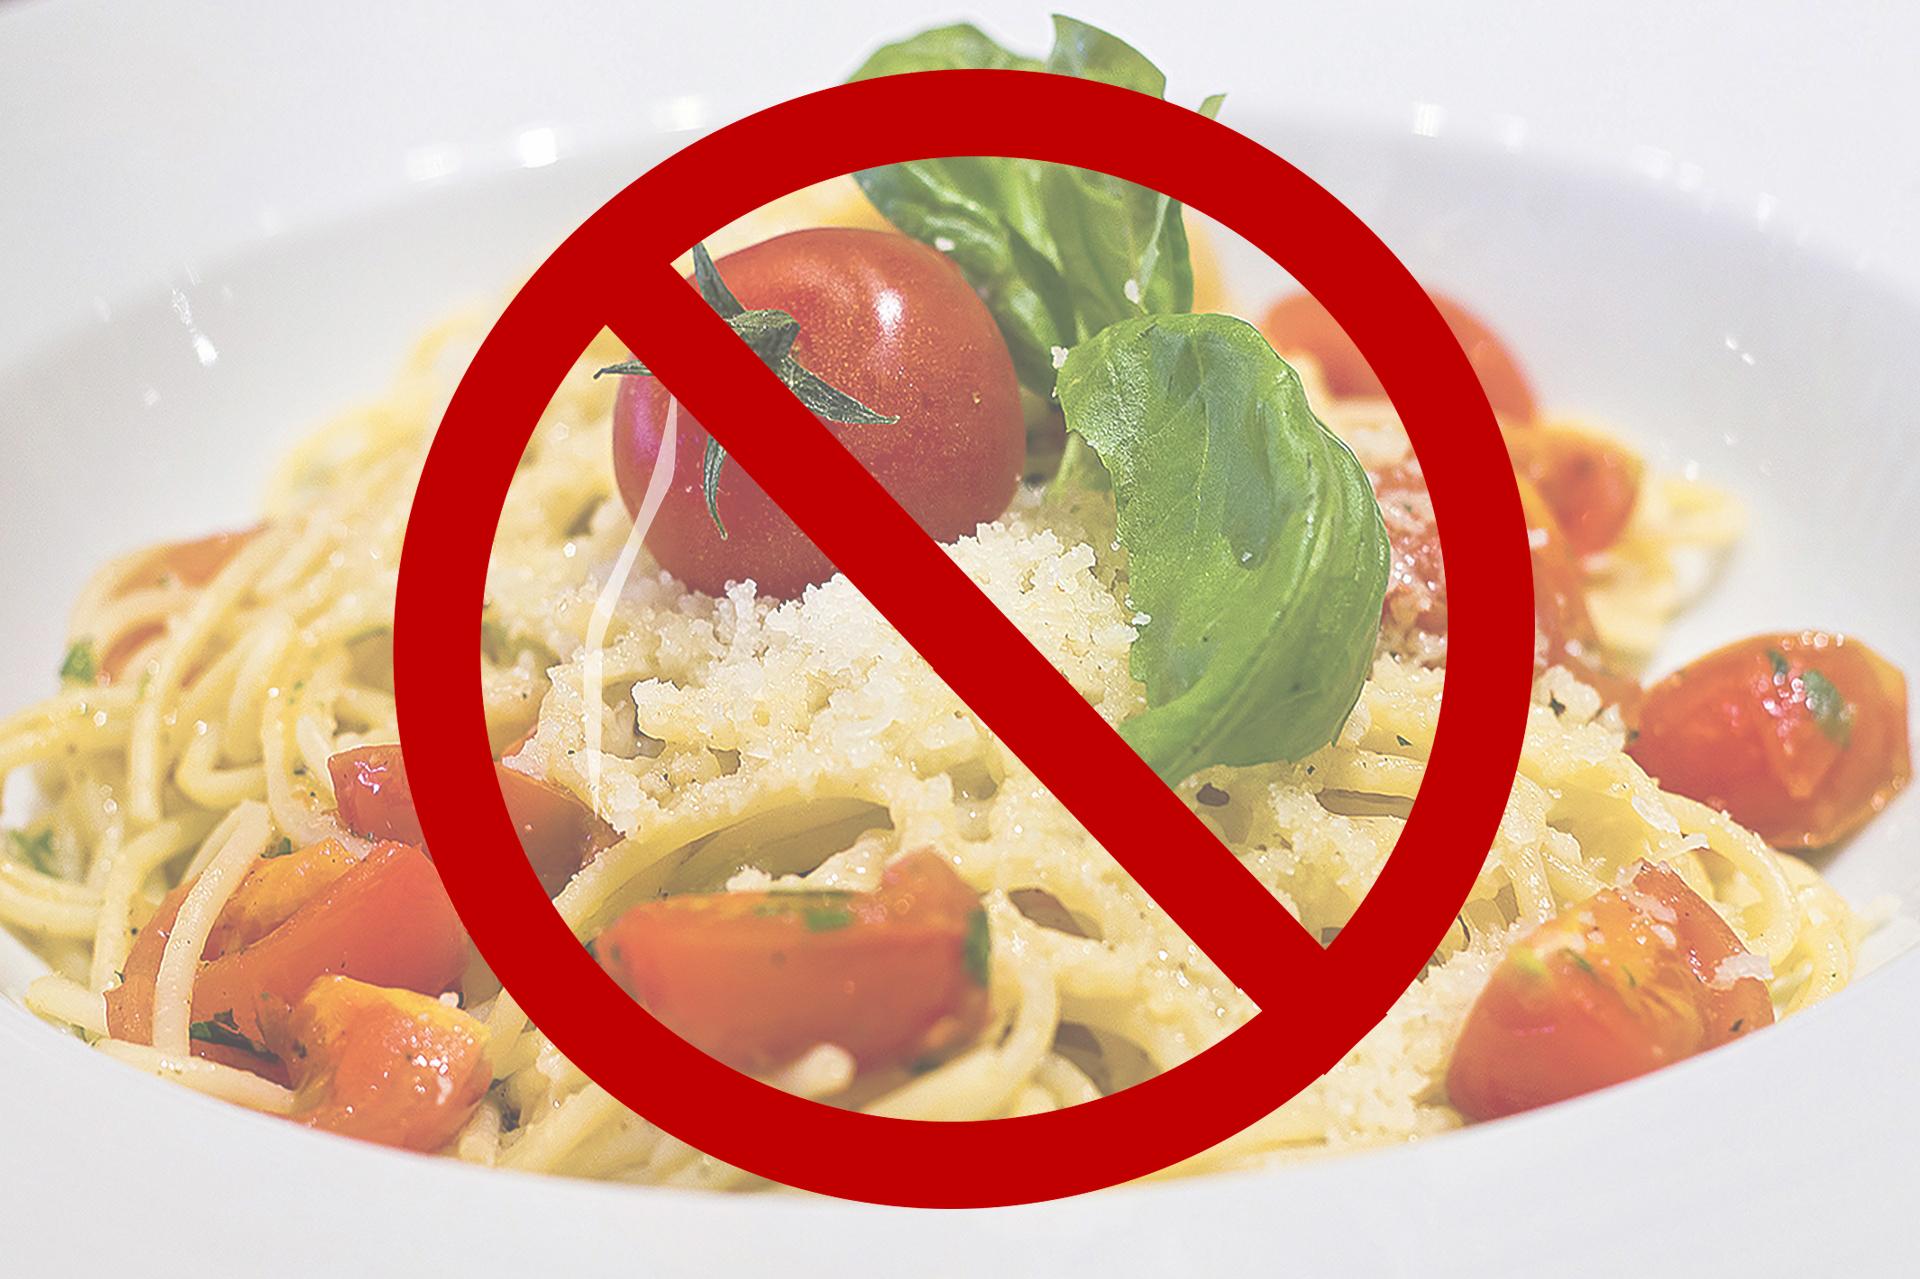 aliments interdits regime